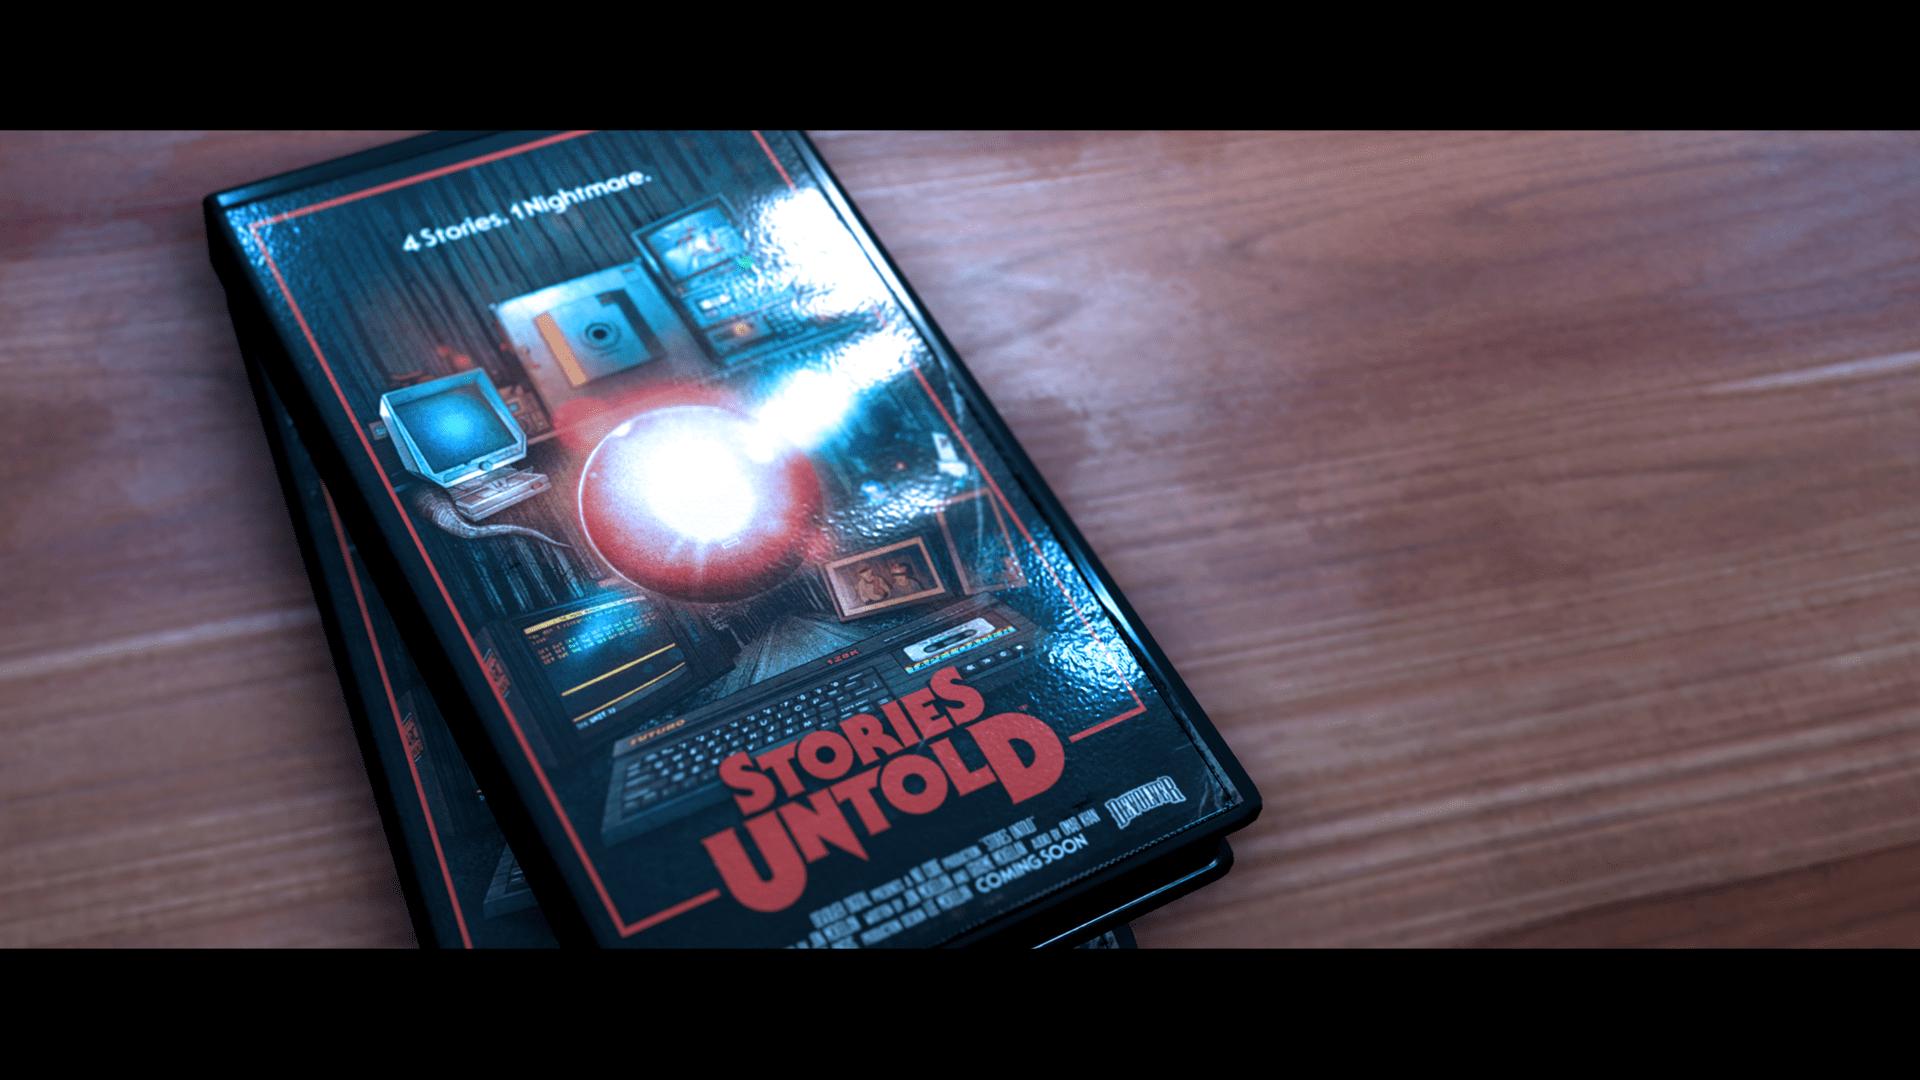 Review: Stories Untold